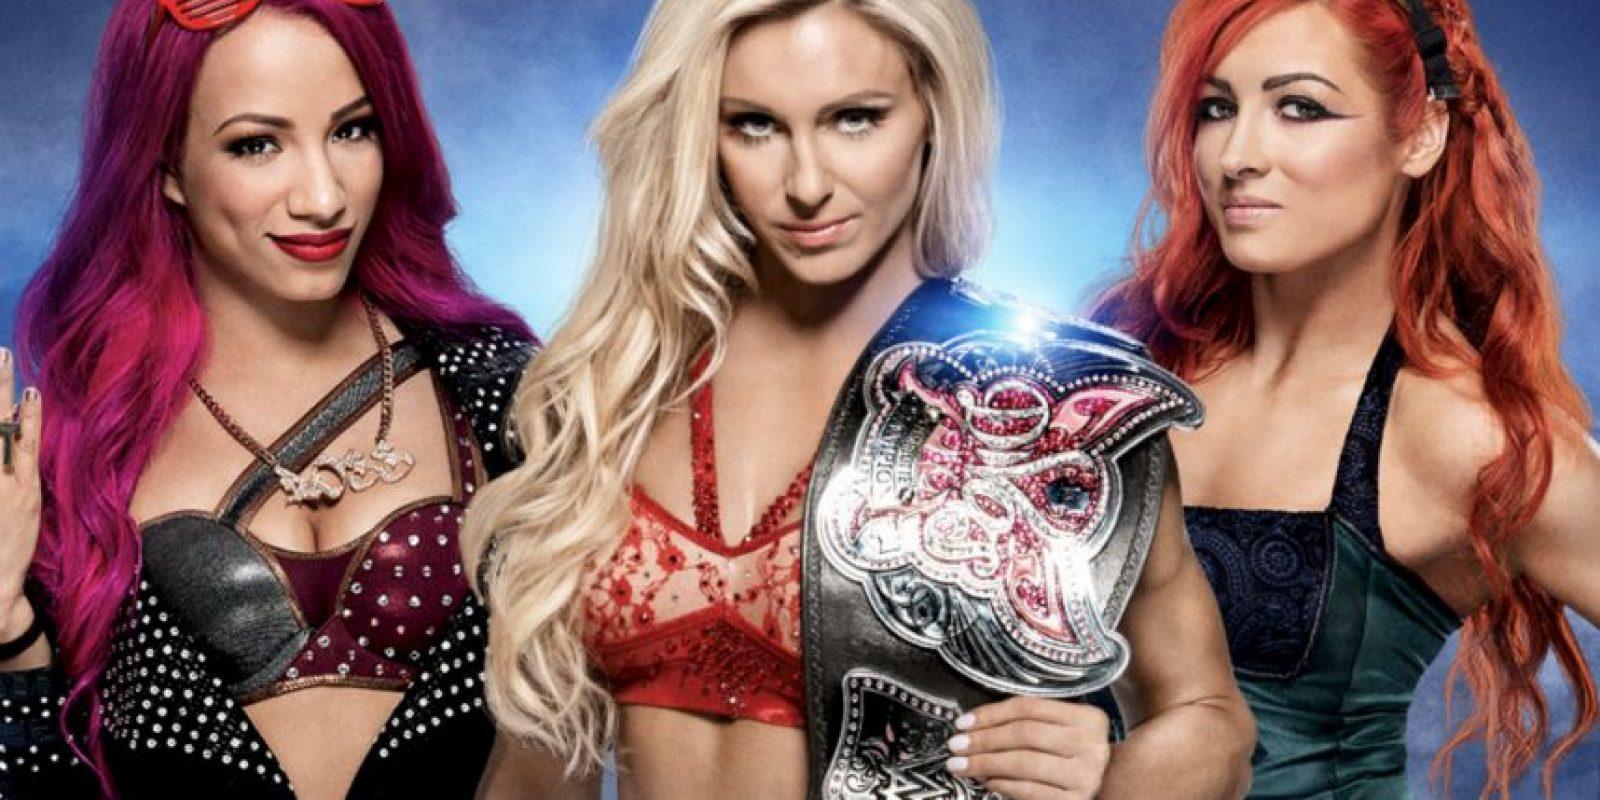 Campeonato de Divas: Charlotte vs. Becky Lynch vs Sasha Banks Foto:WWE